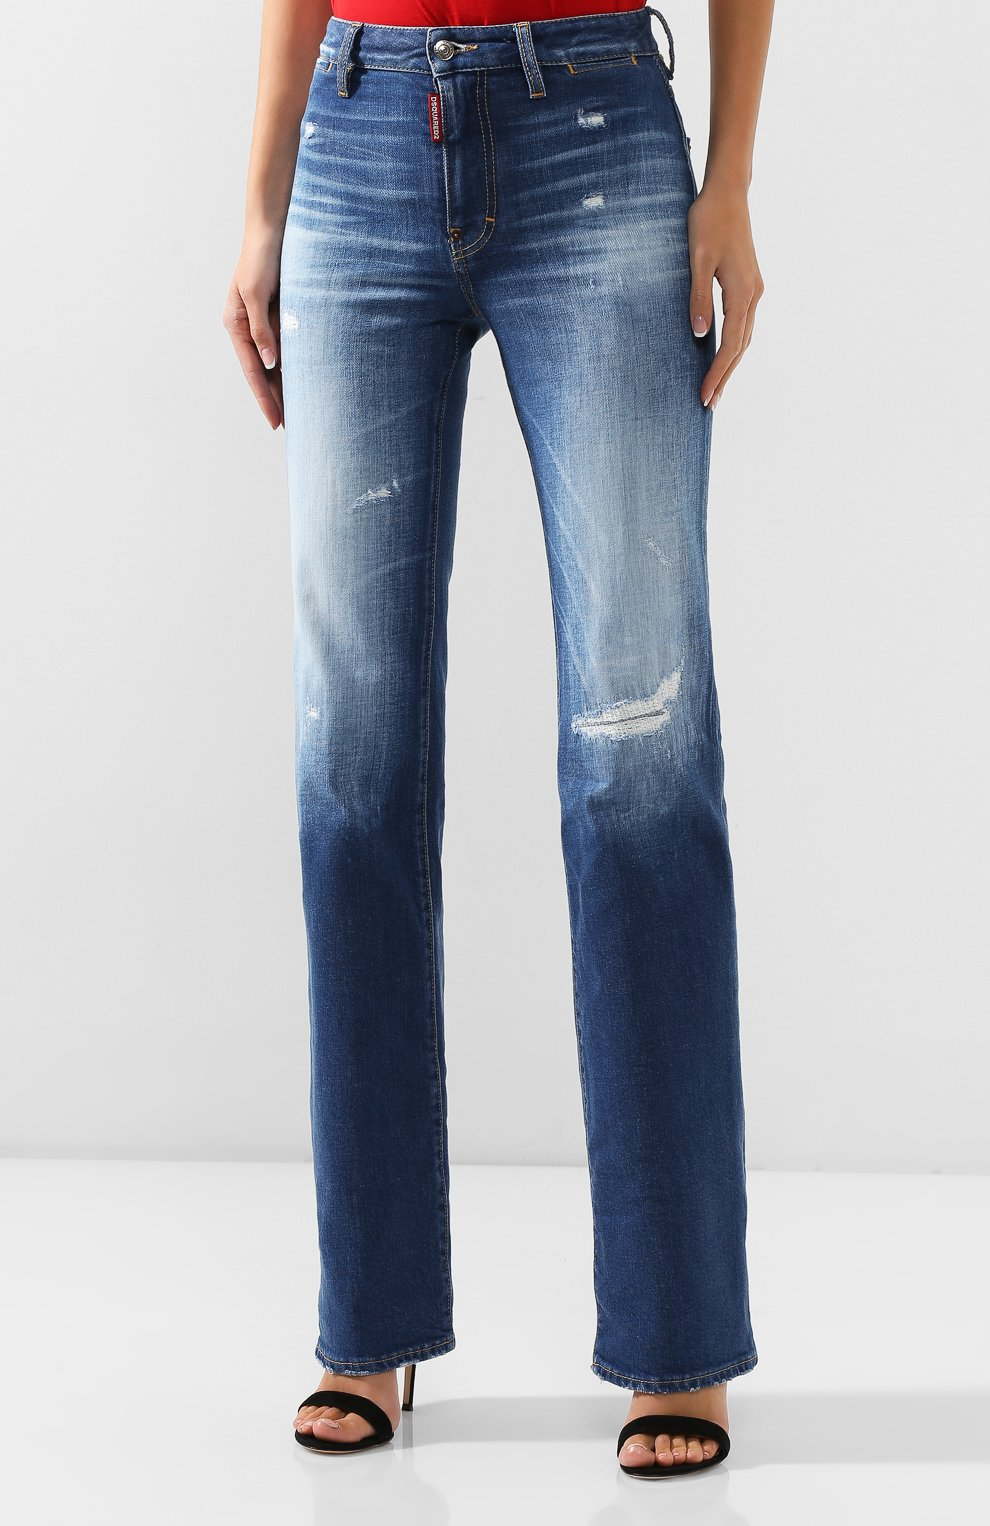 Женские джинсы DSQUARED2 синего цвета, арт. S75LB0314/S30663 | Фото 3